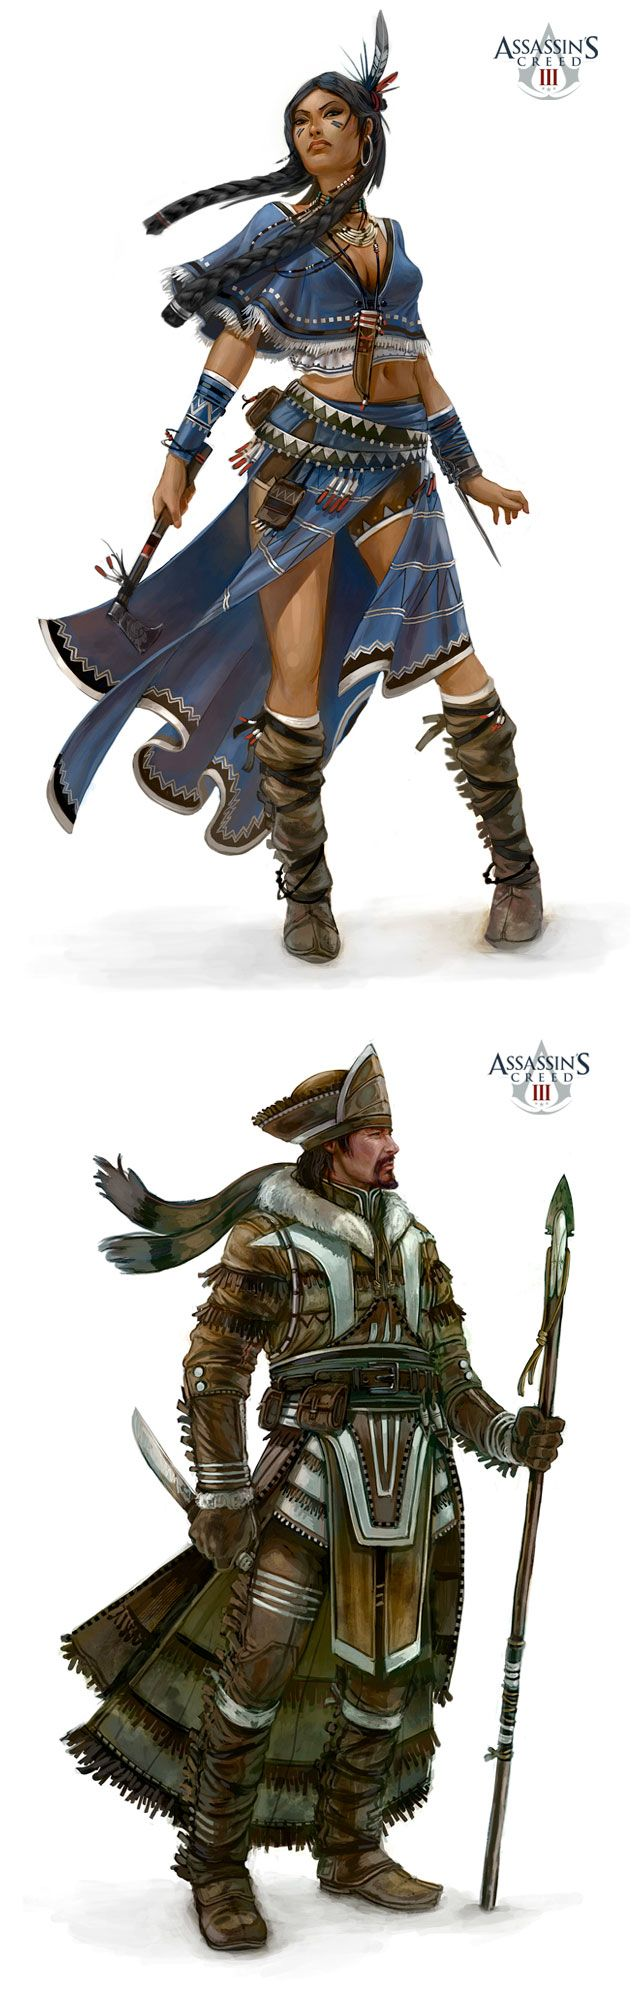 Assassins-ConceptArts-Antoine-3